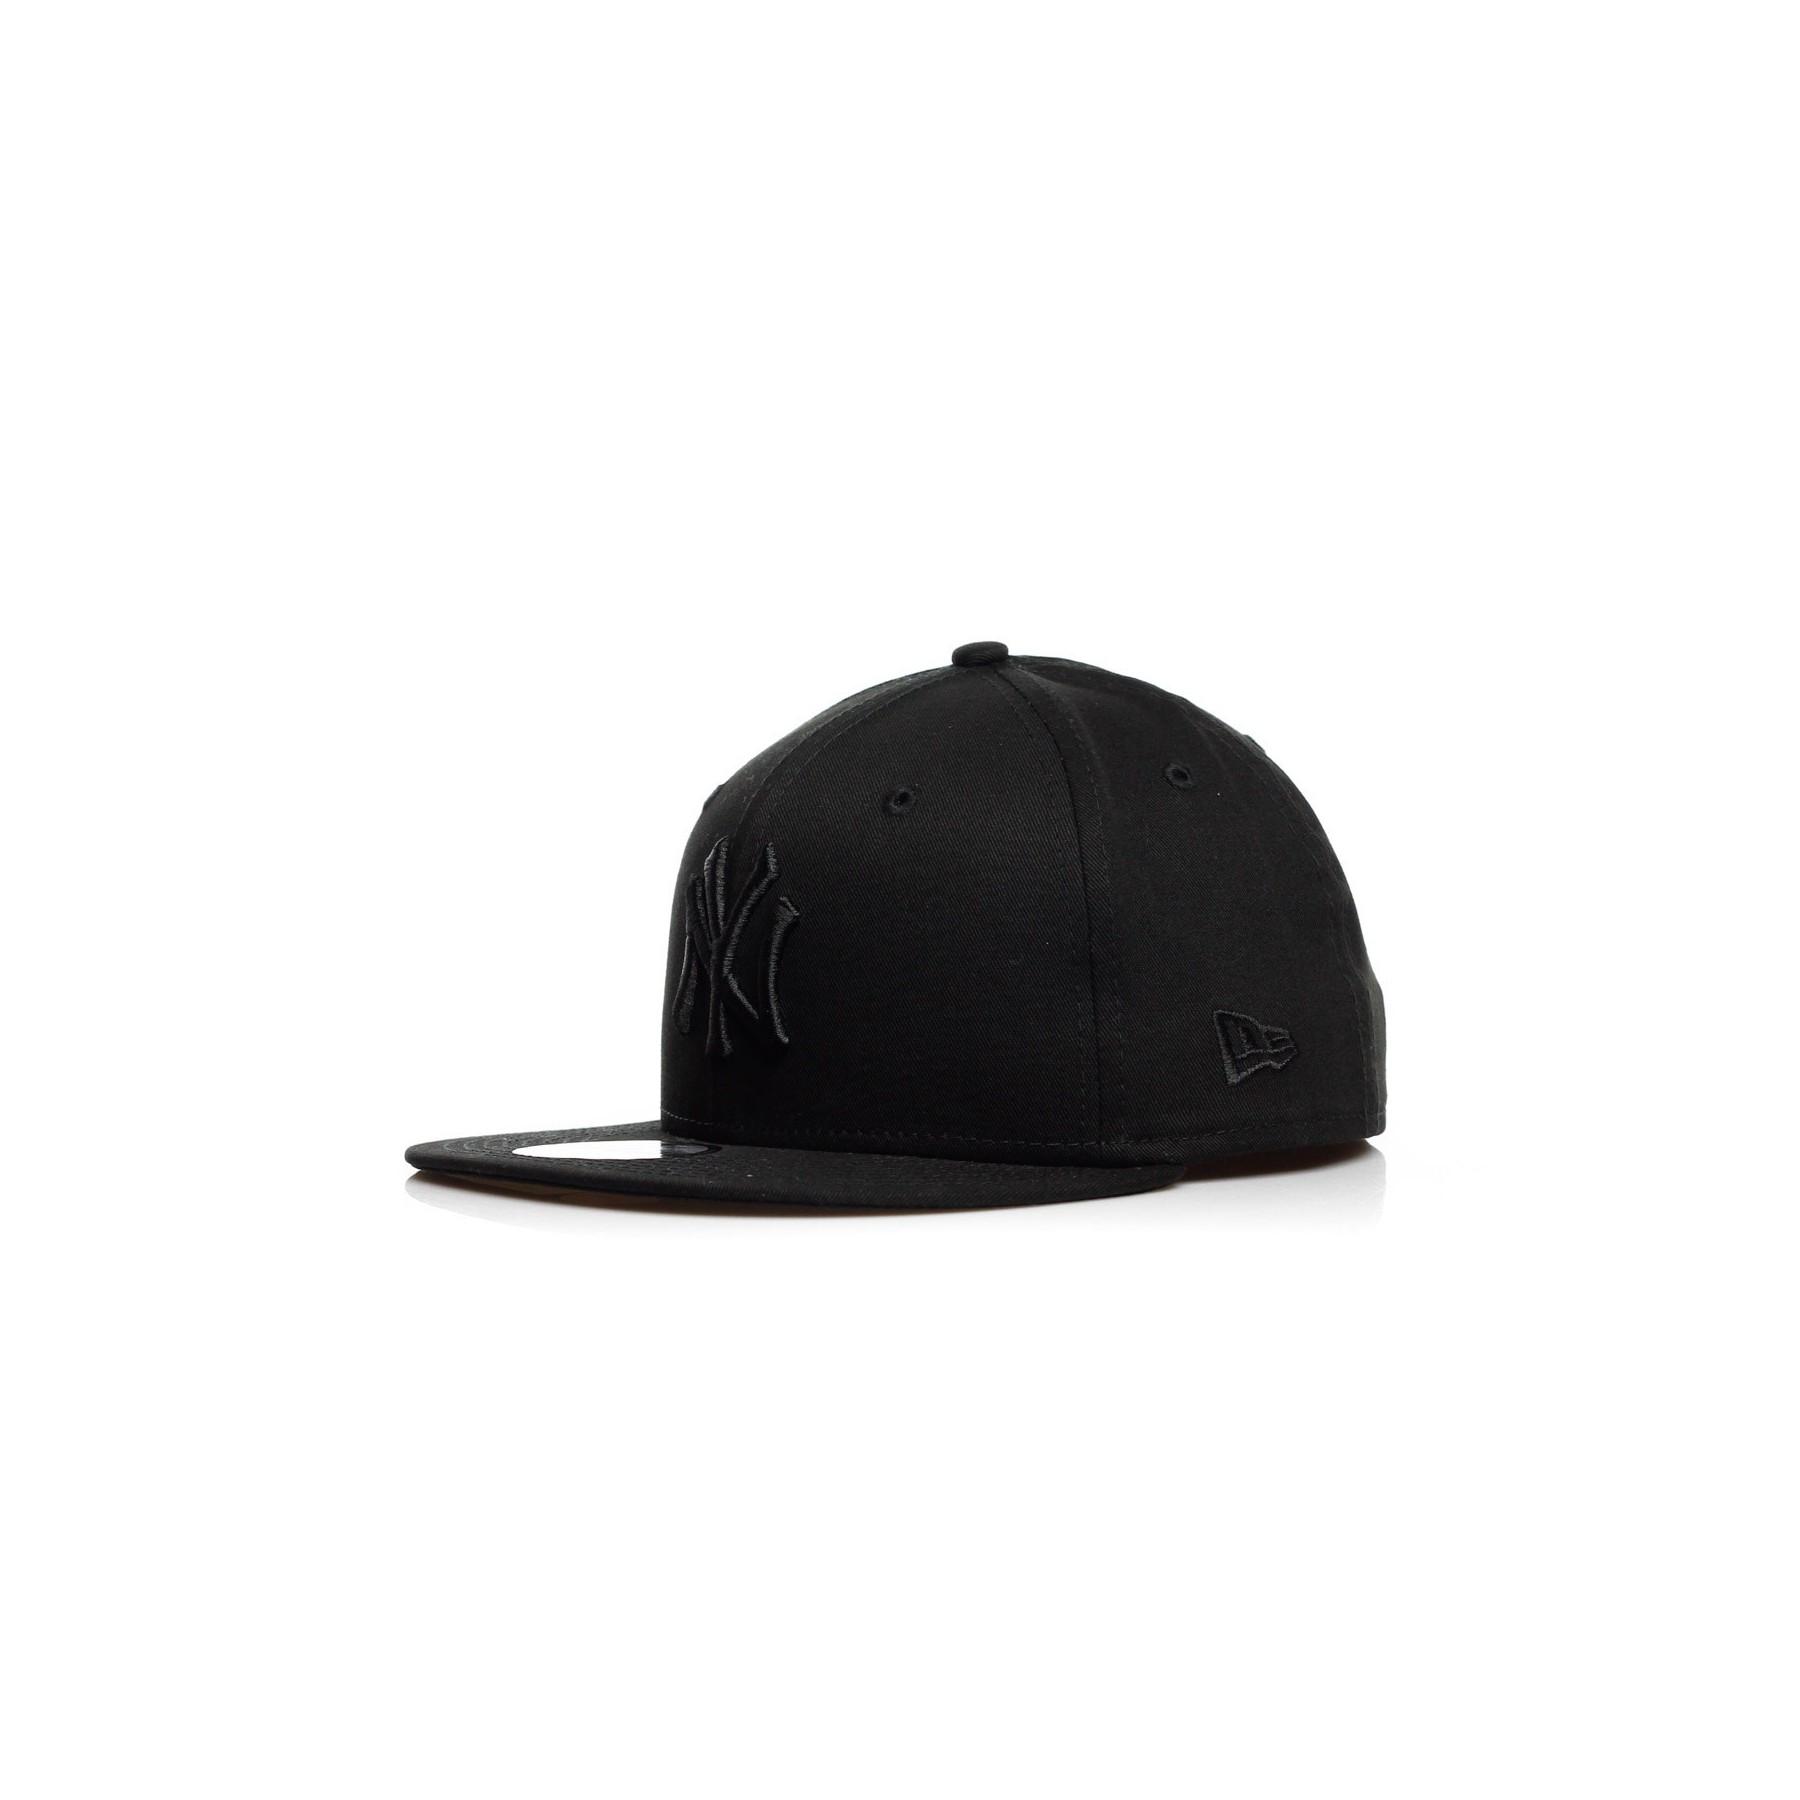 CAPPELLO SNAPBACK MLB 9FIFTY NEYYAN BLACK BLACK  9c667edbc68